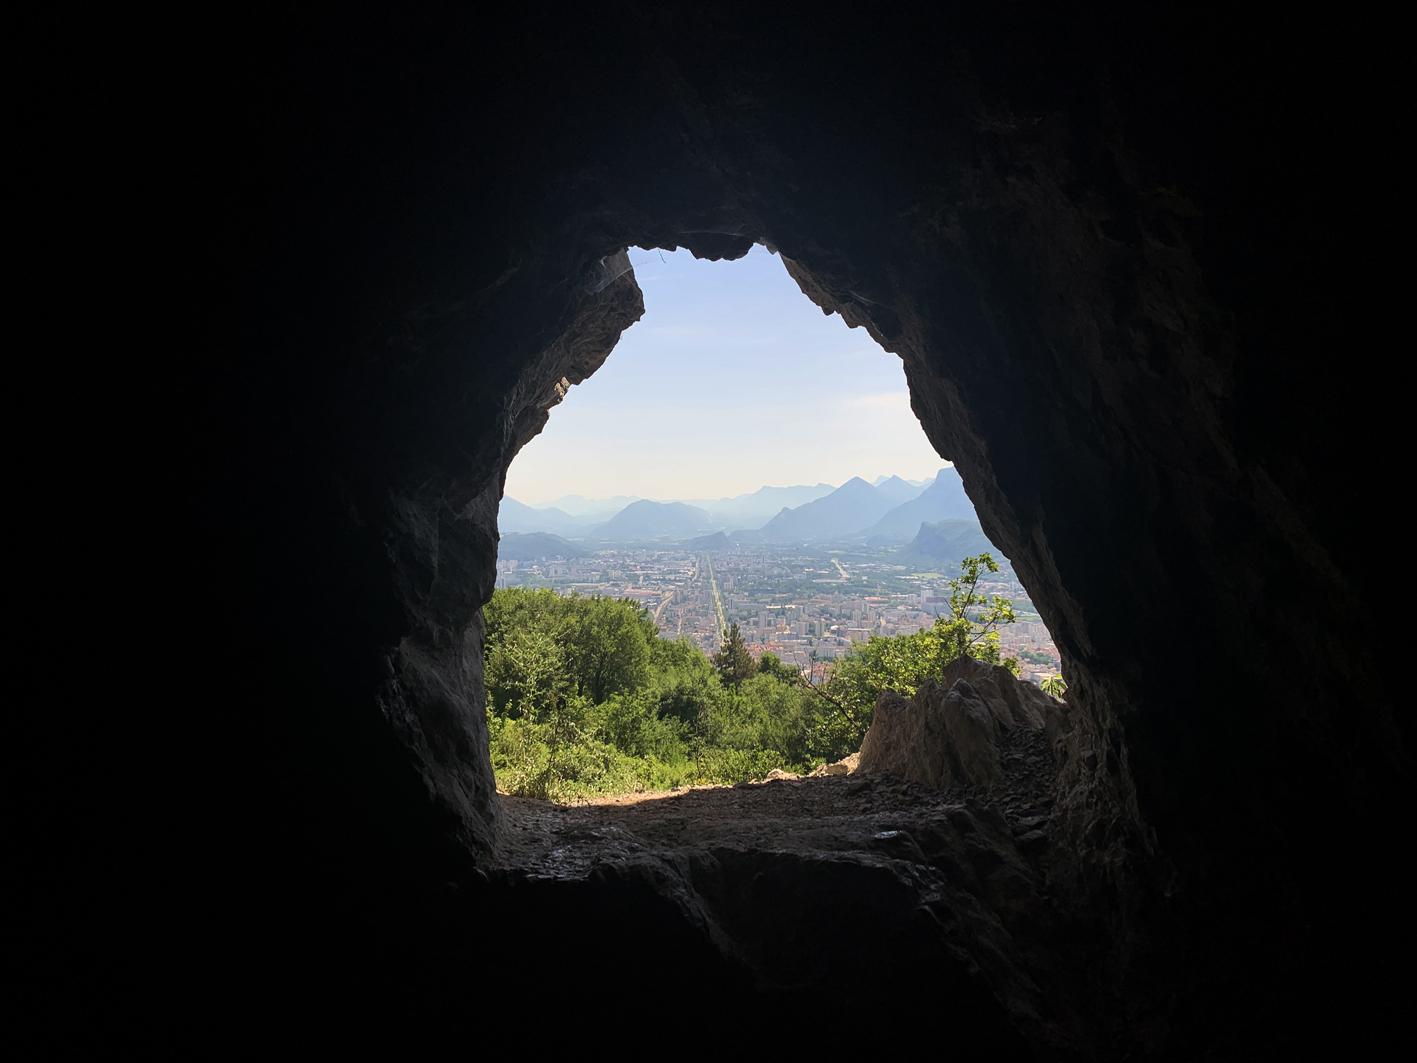 https://static.apidae-tourisme.com/filestore/objets-touristiques/images/110/173…